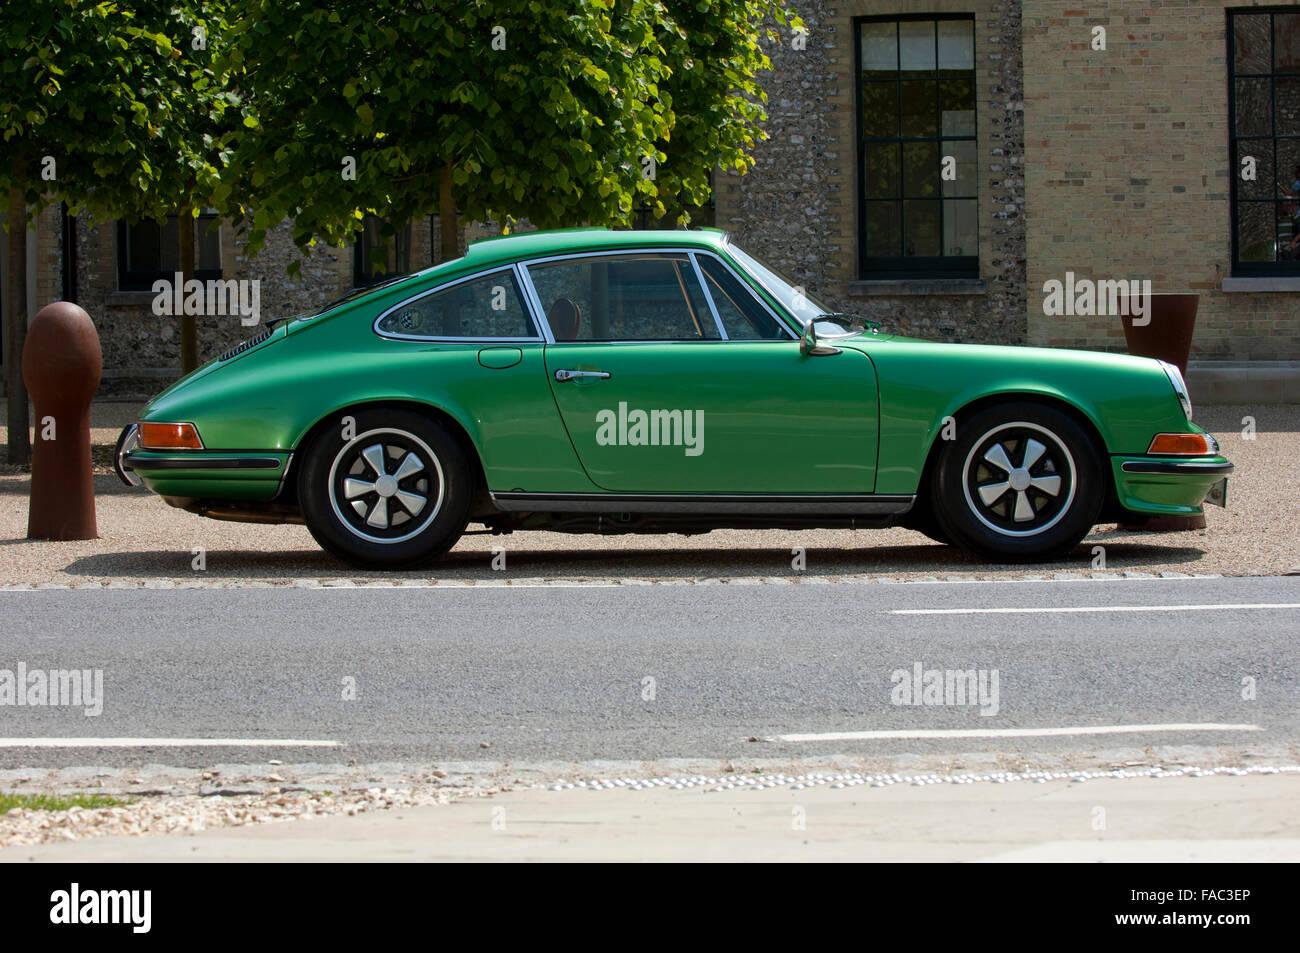 1972 Porsche 911S Classic German Air Cooled Sports Car